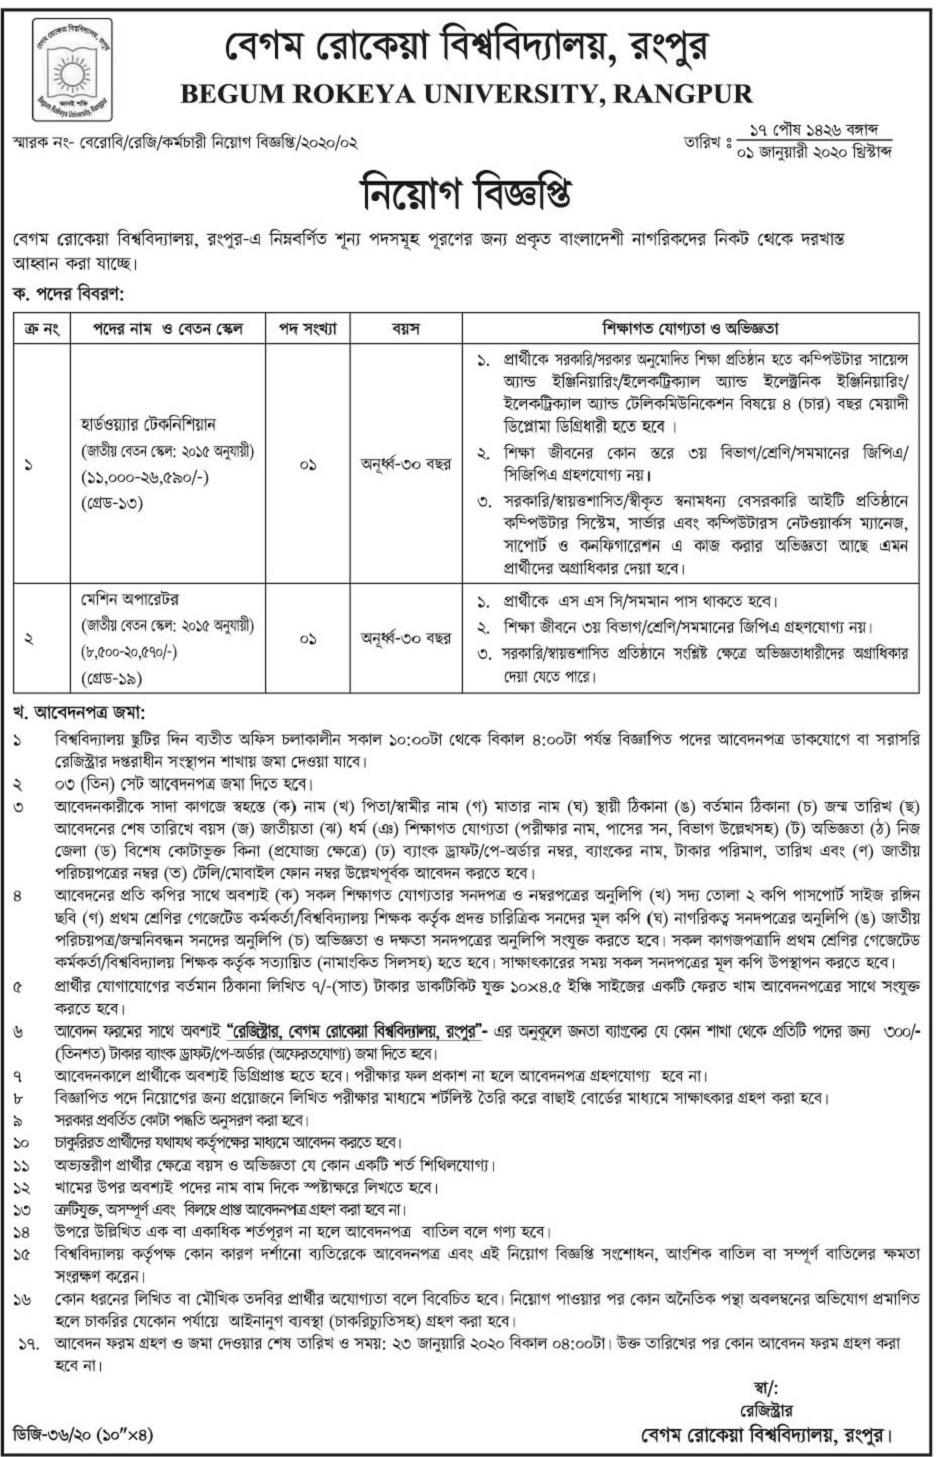 Begum Rokeya University Job Circular 2020